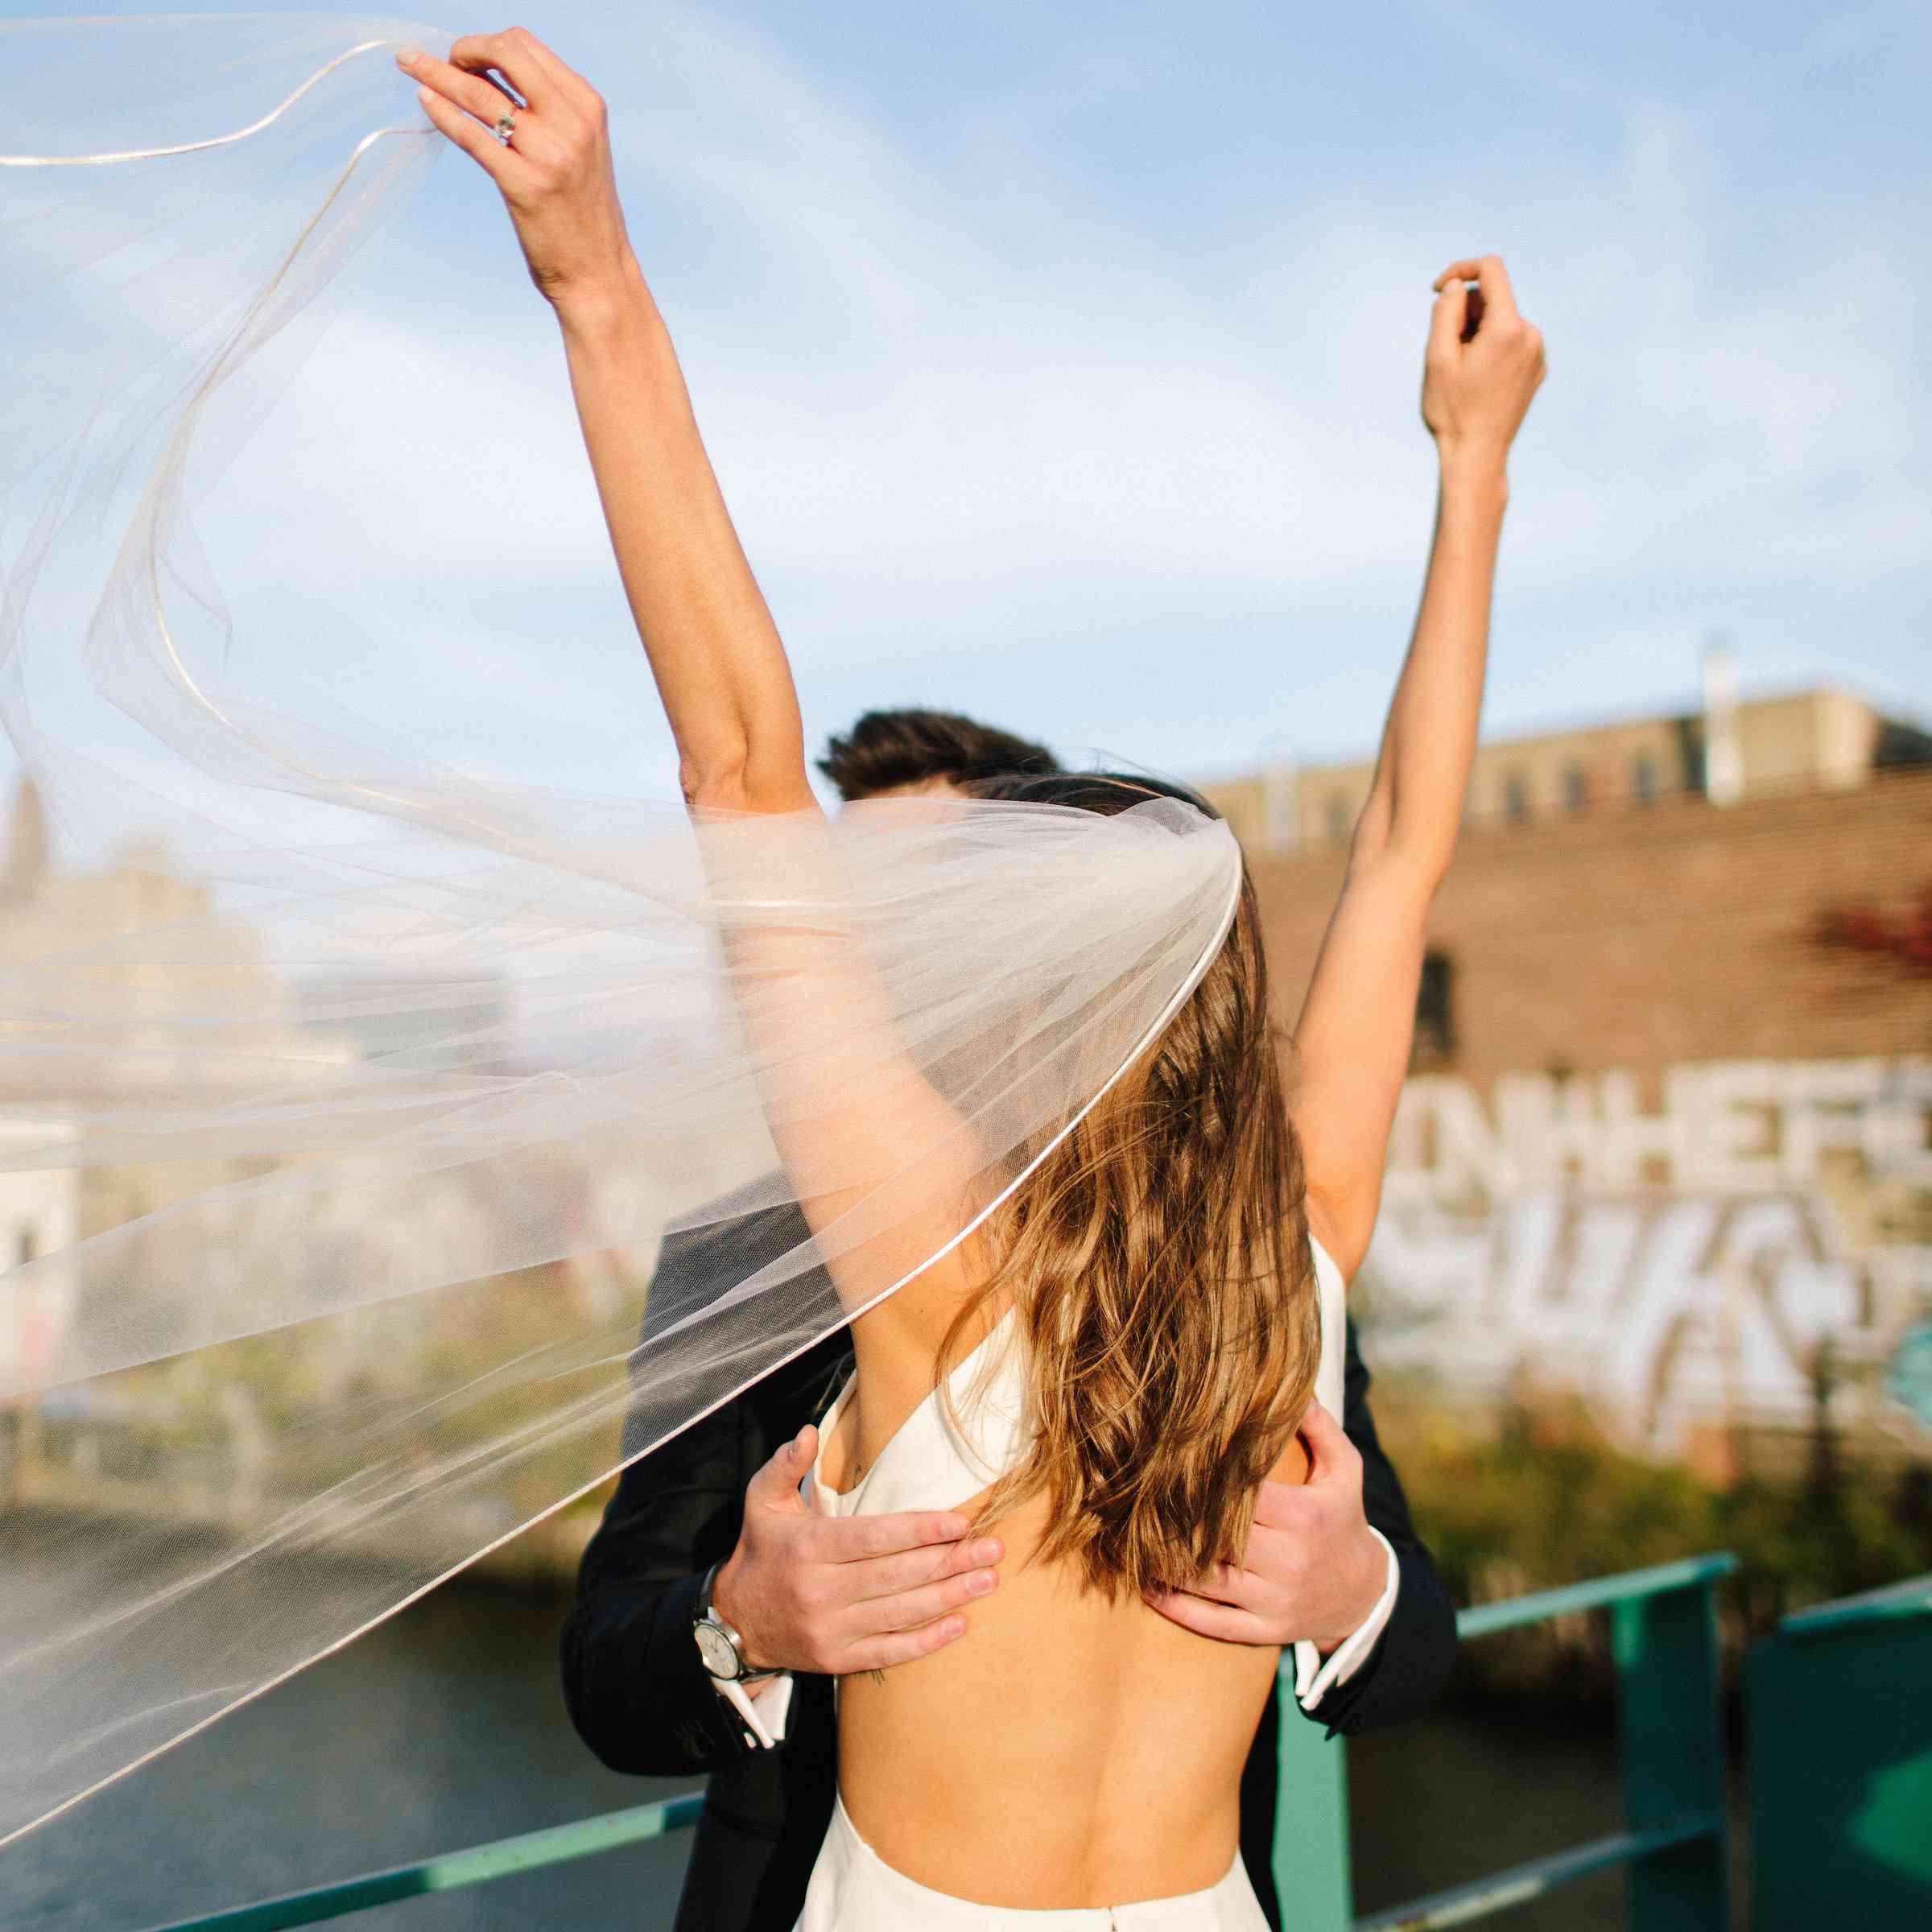 Bride holding veil in wind